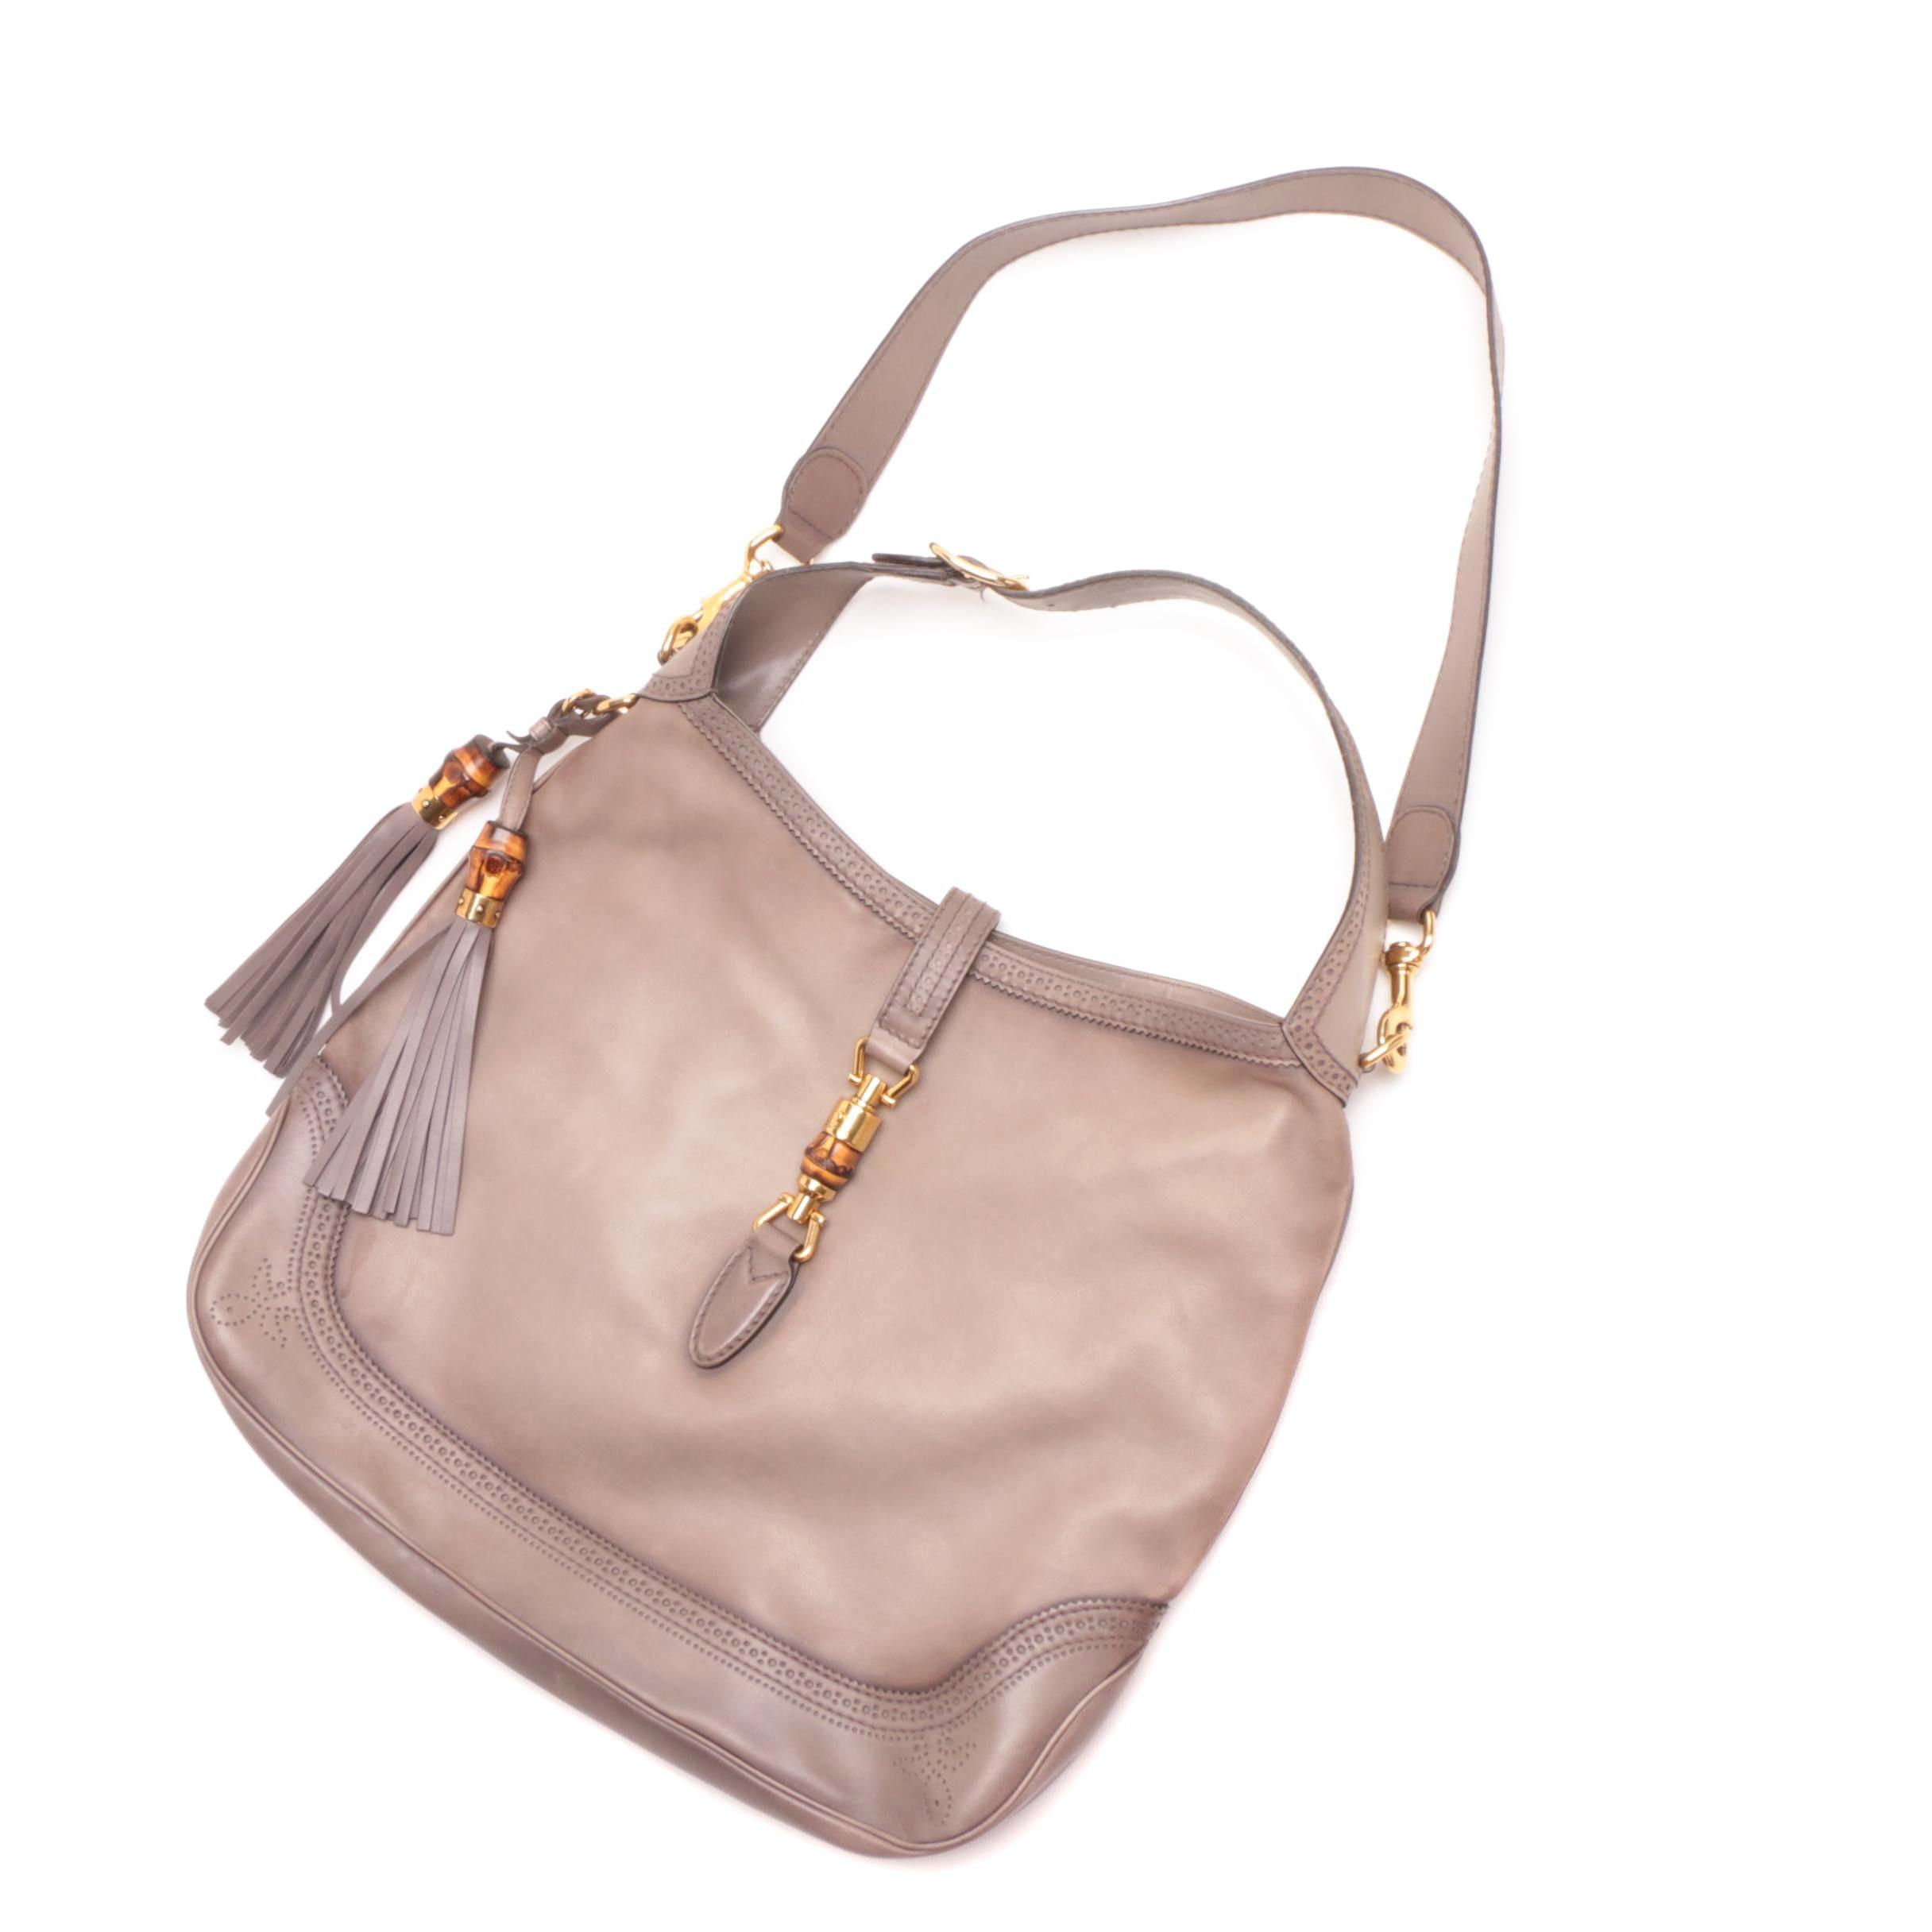 Gucci Gray Calfskin Duilio Brogue Large New Jackie Shoulder Bag